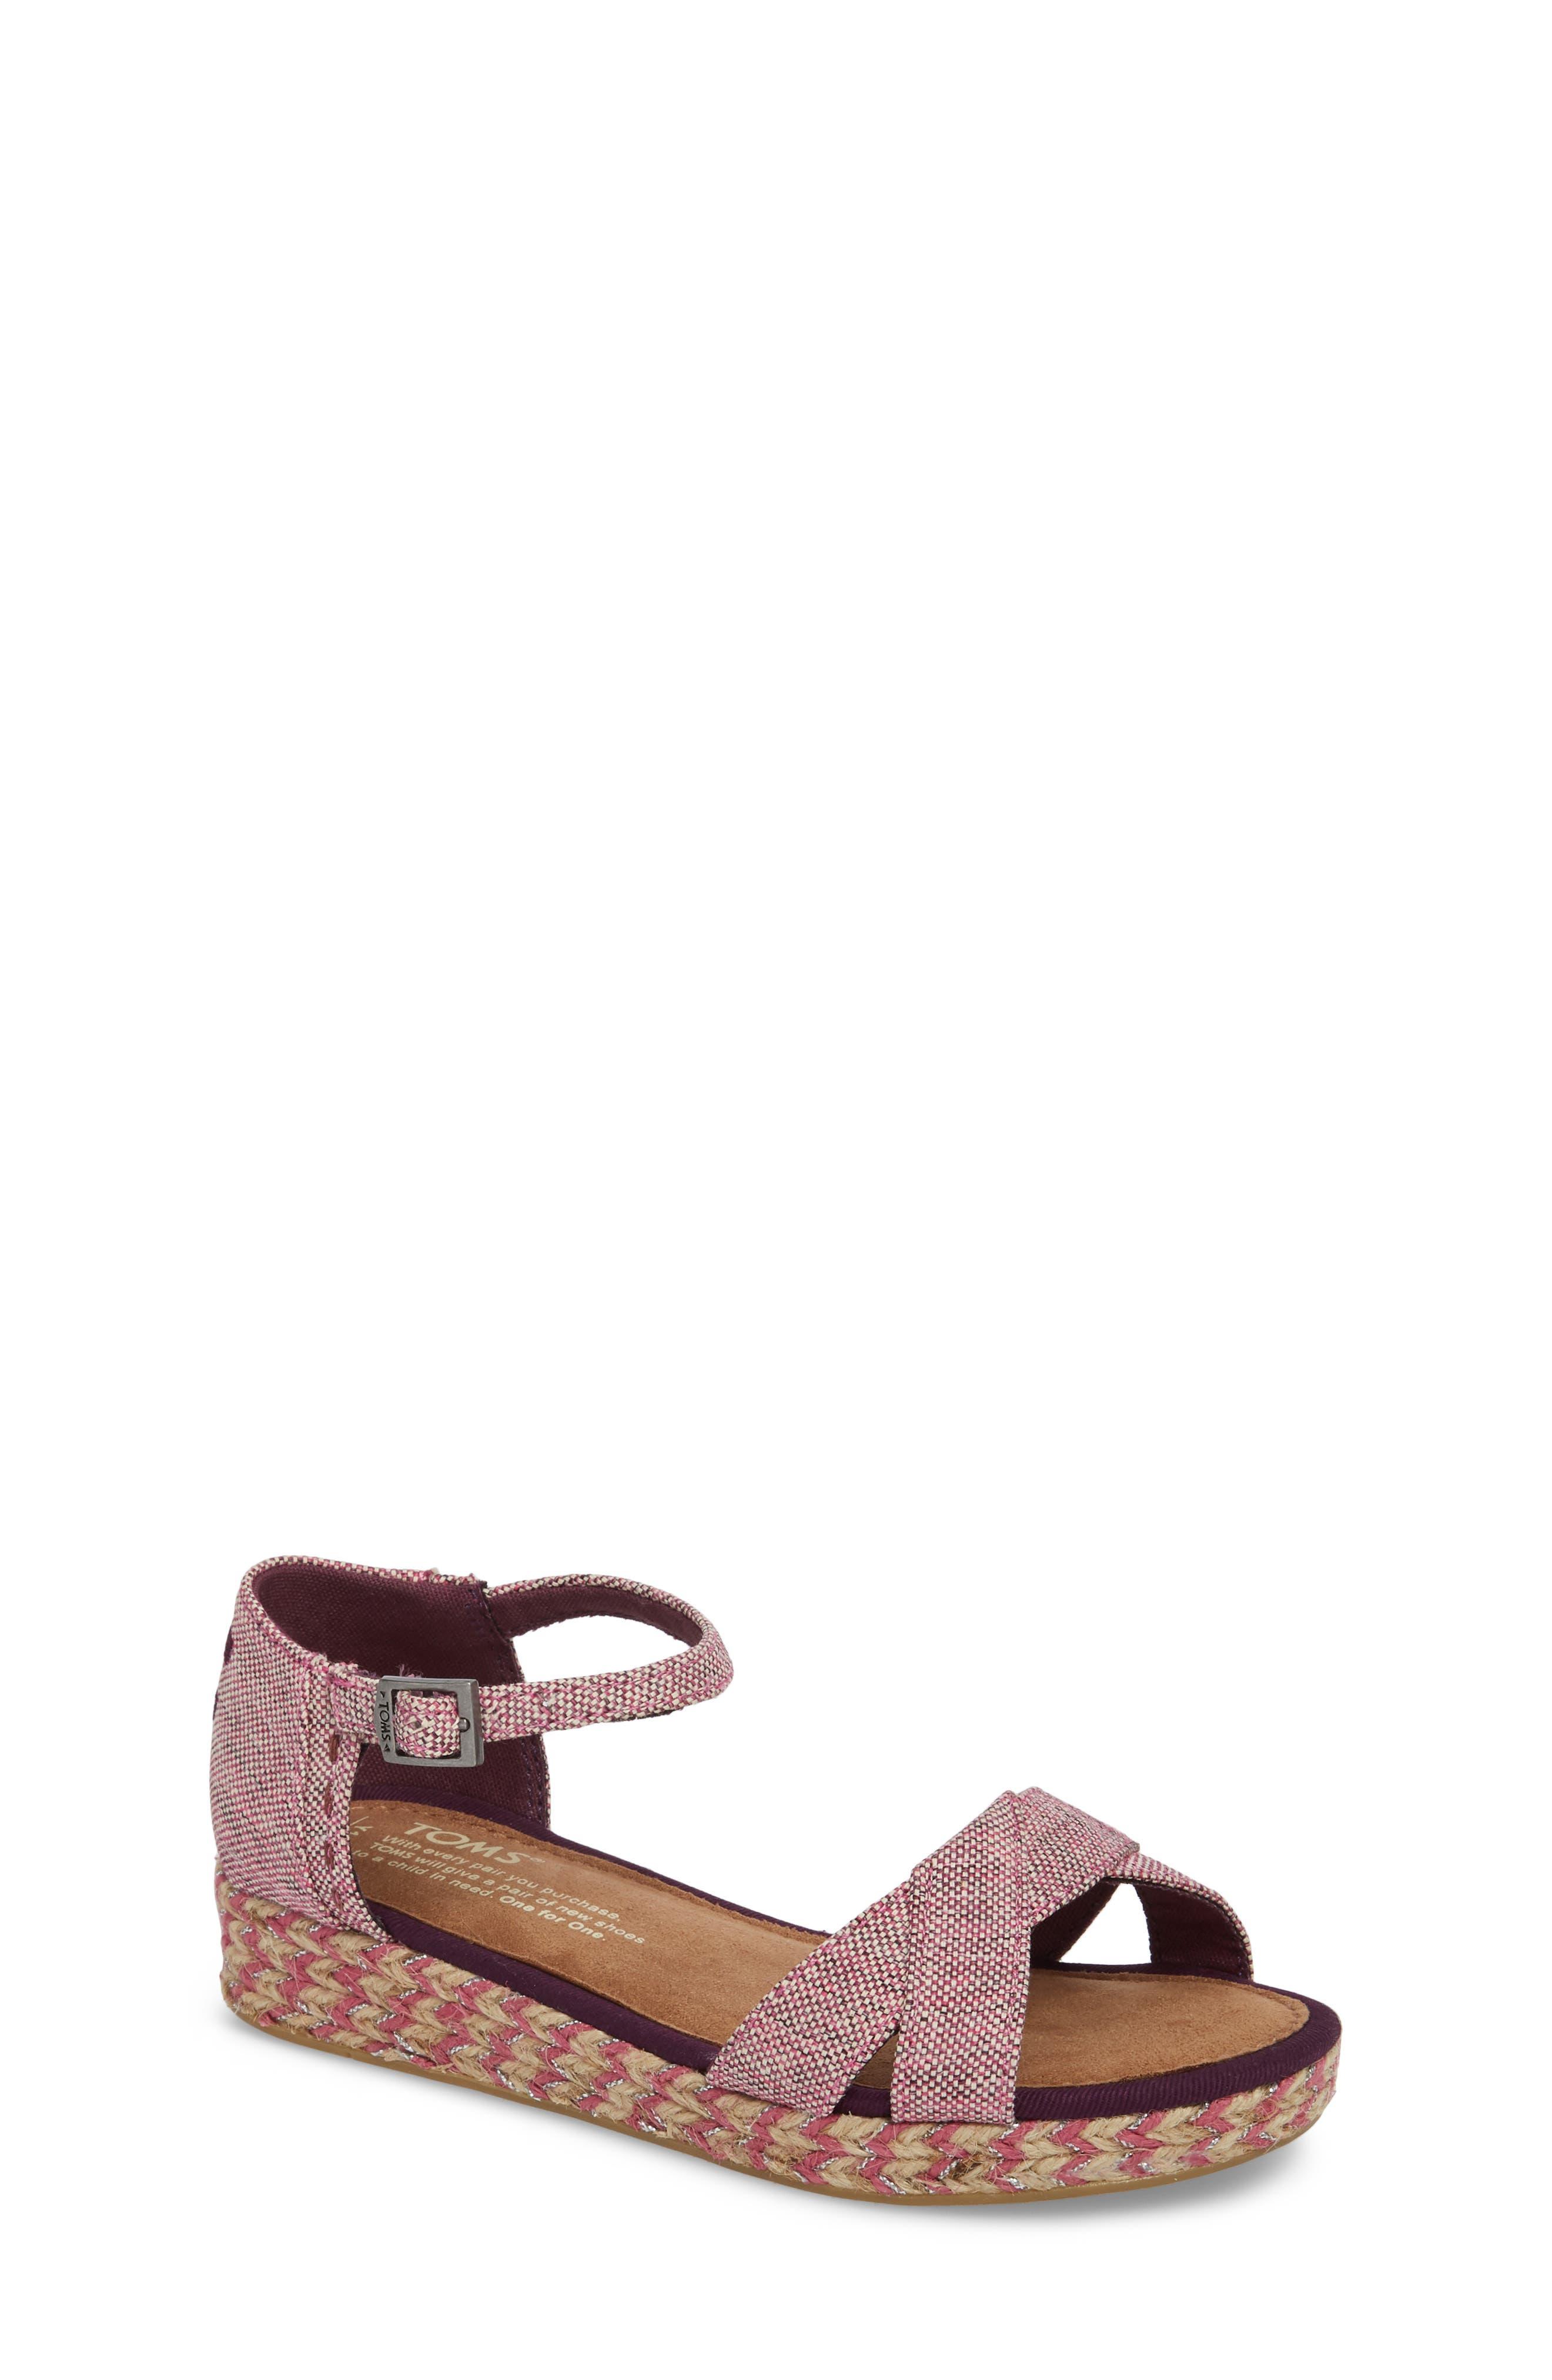 Harper Wedge Sandal,                             Main thumbnail 1, color,                             Plum Oxford Melange